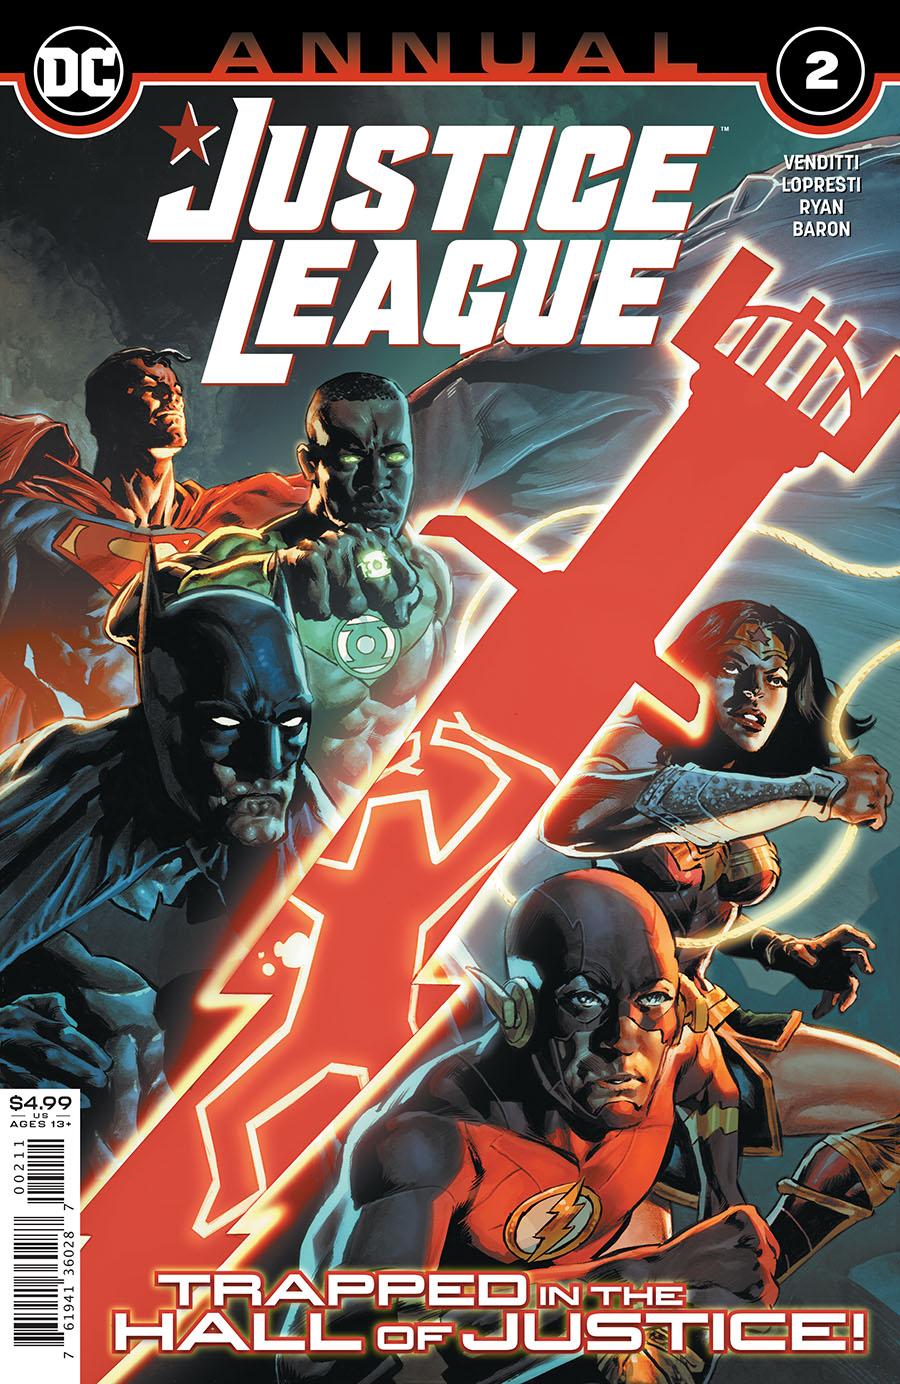 Justice League Vol 4 Annual #2